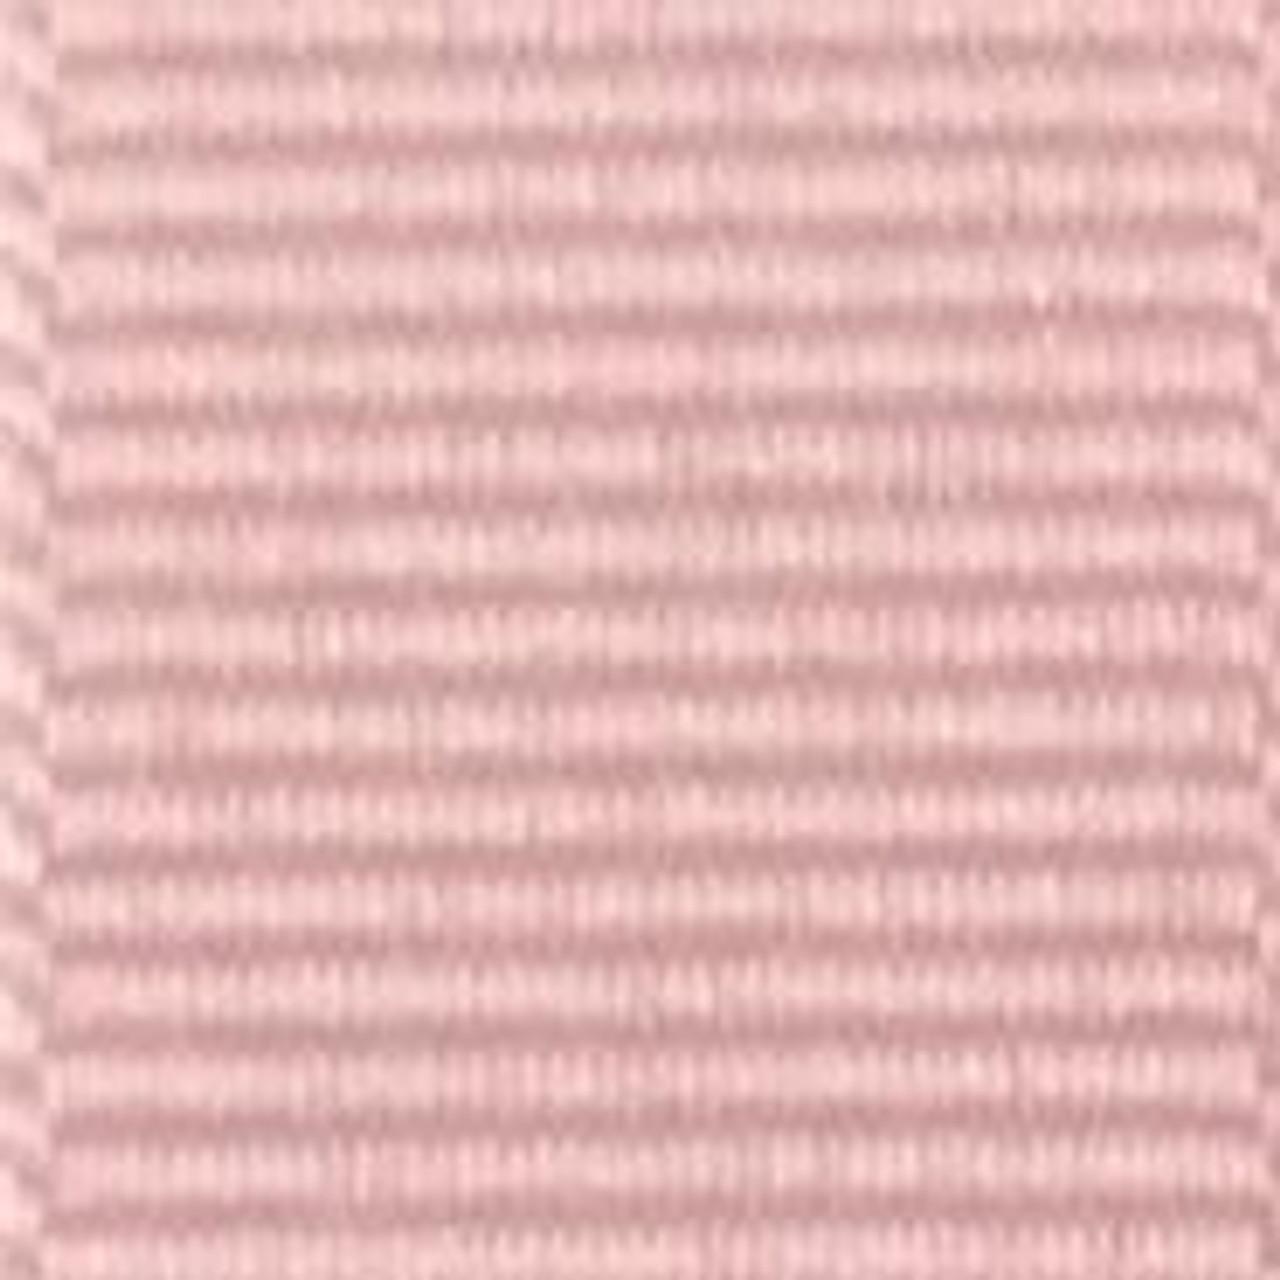 Light Pink Solid Grosgrain Ribbon